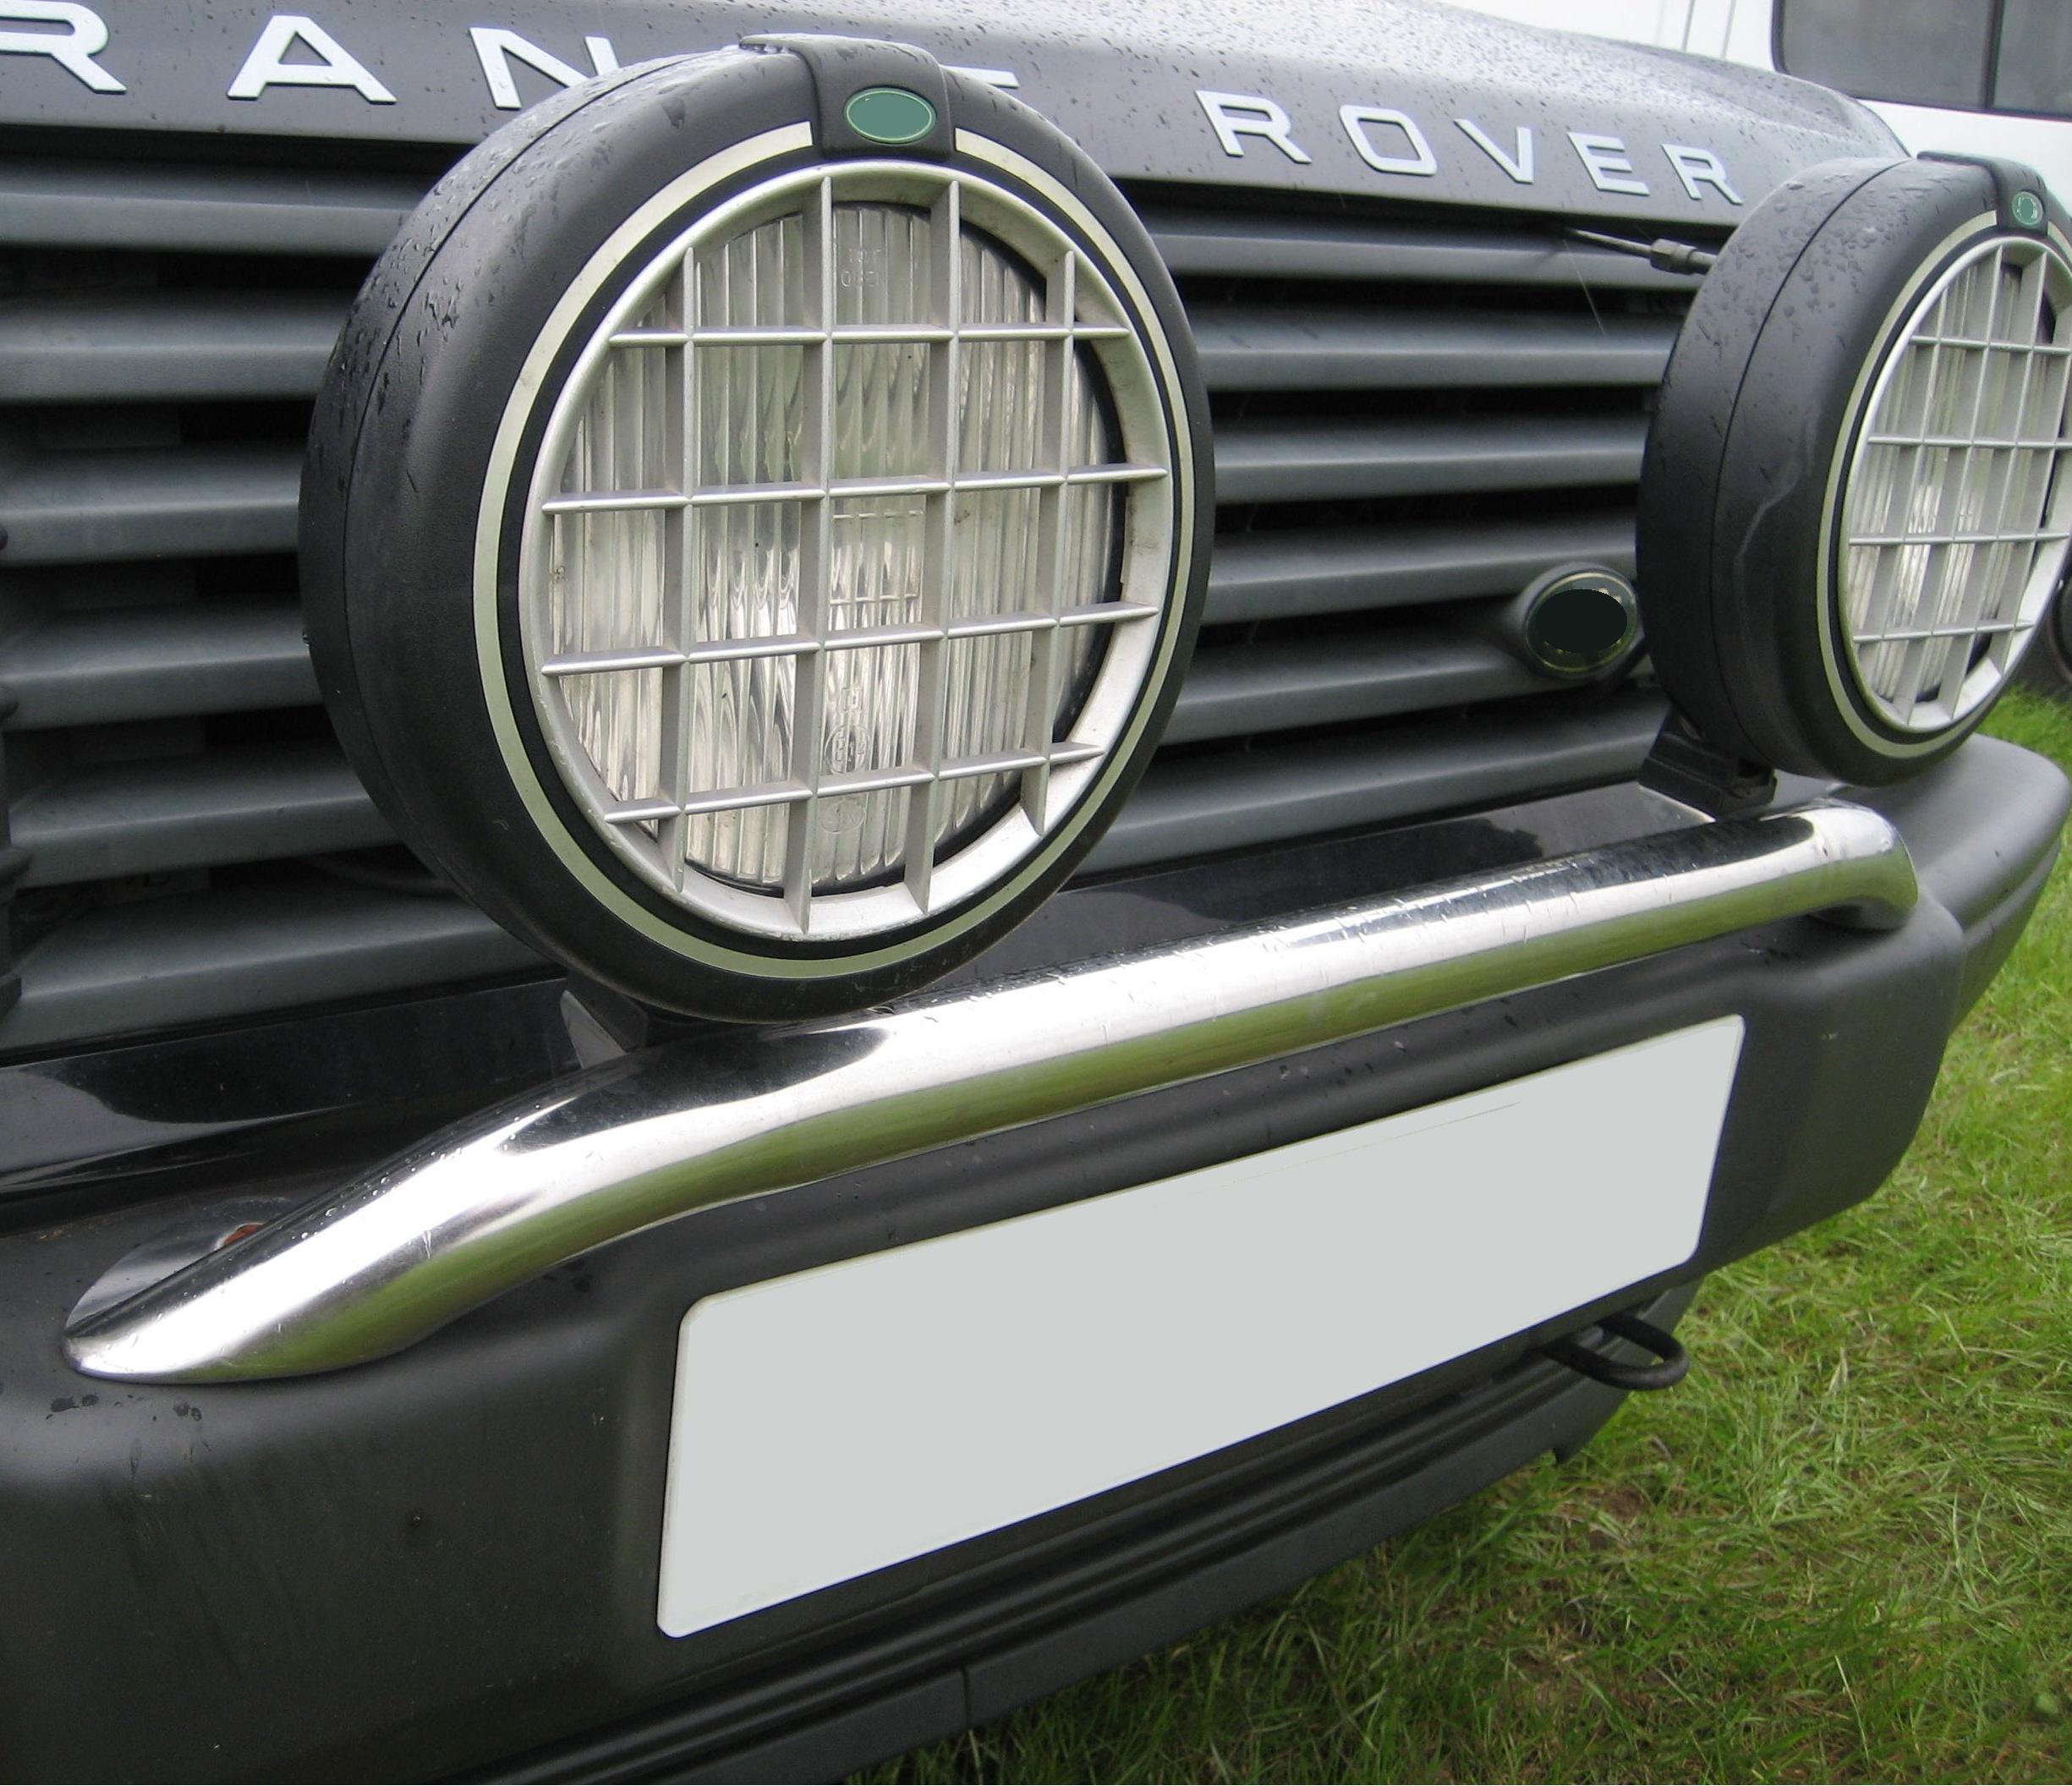 A Chrome Front Bumper Spot Light Mounting Bar For Range